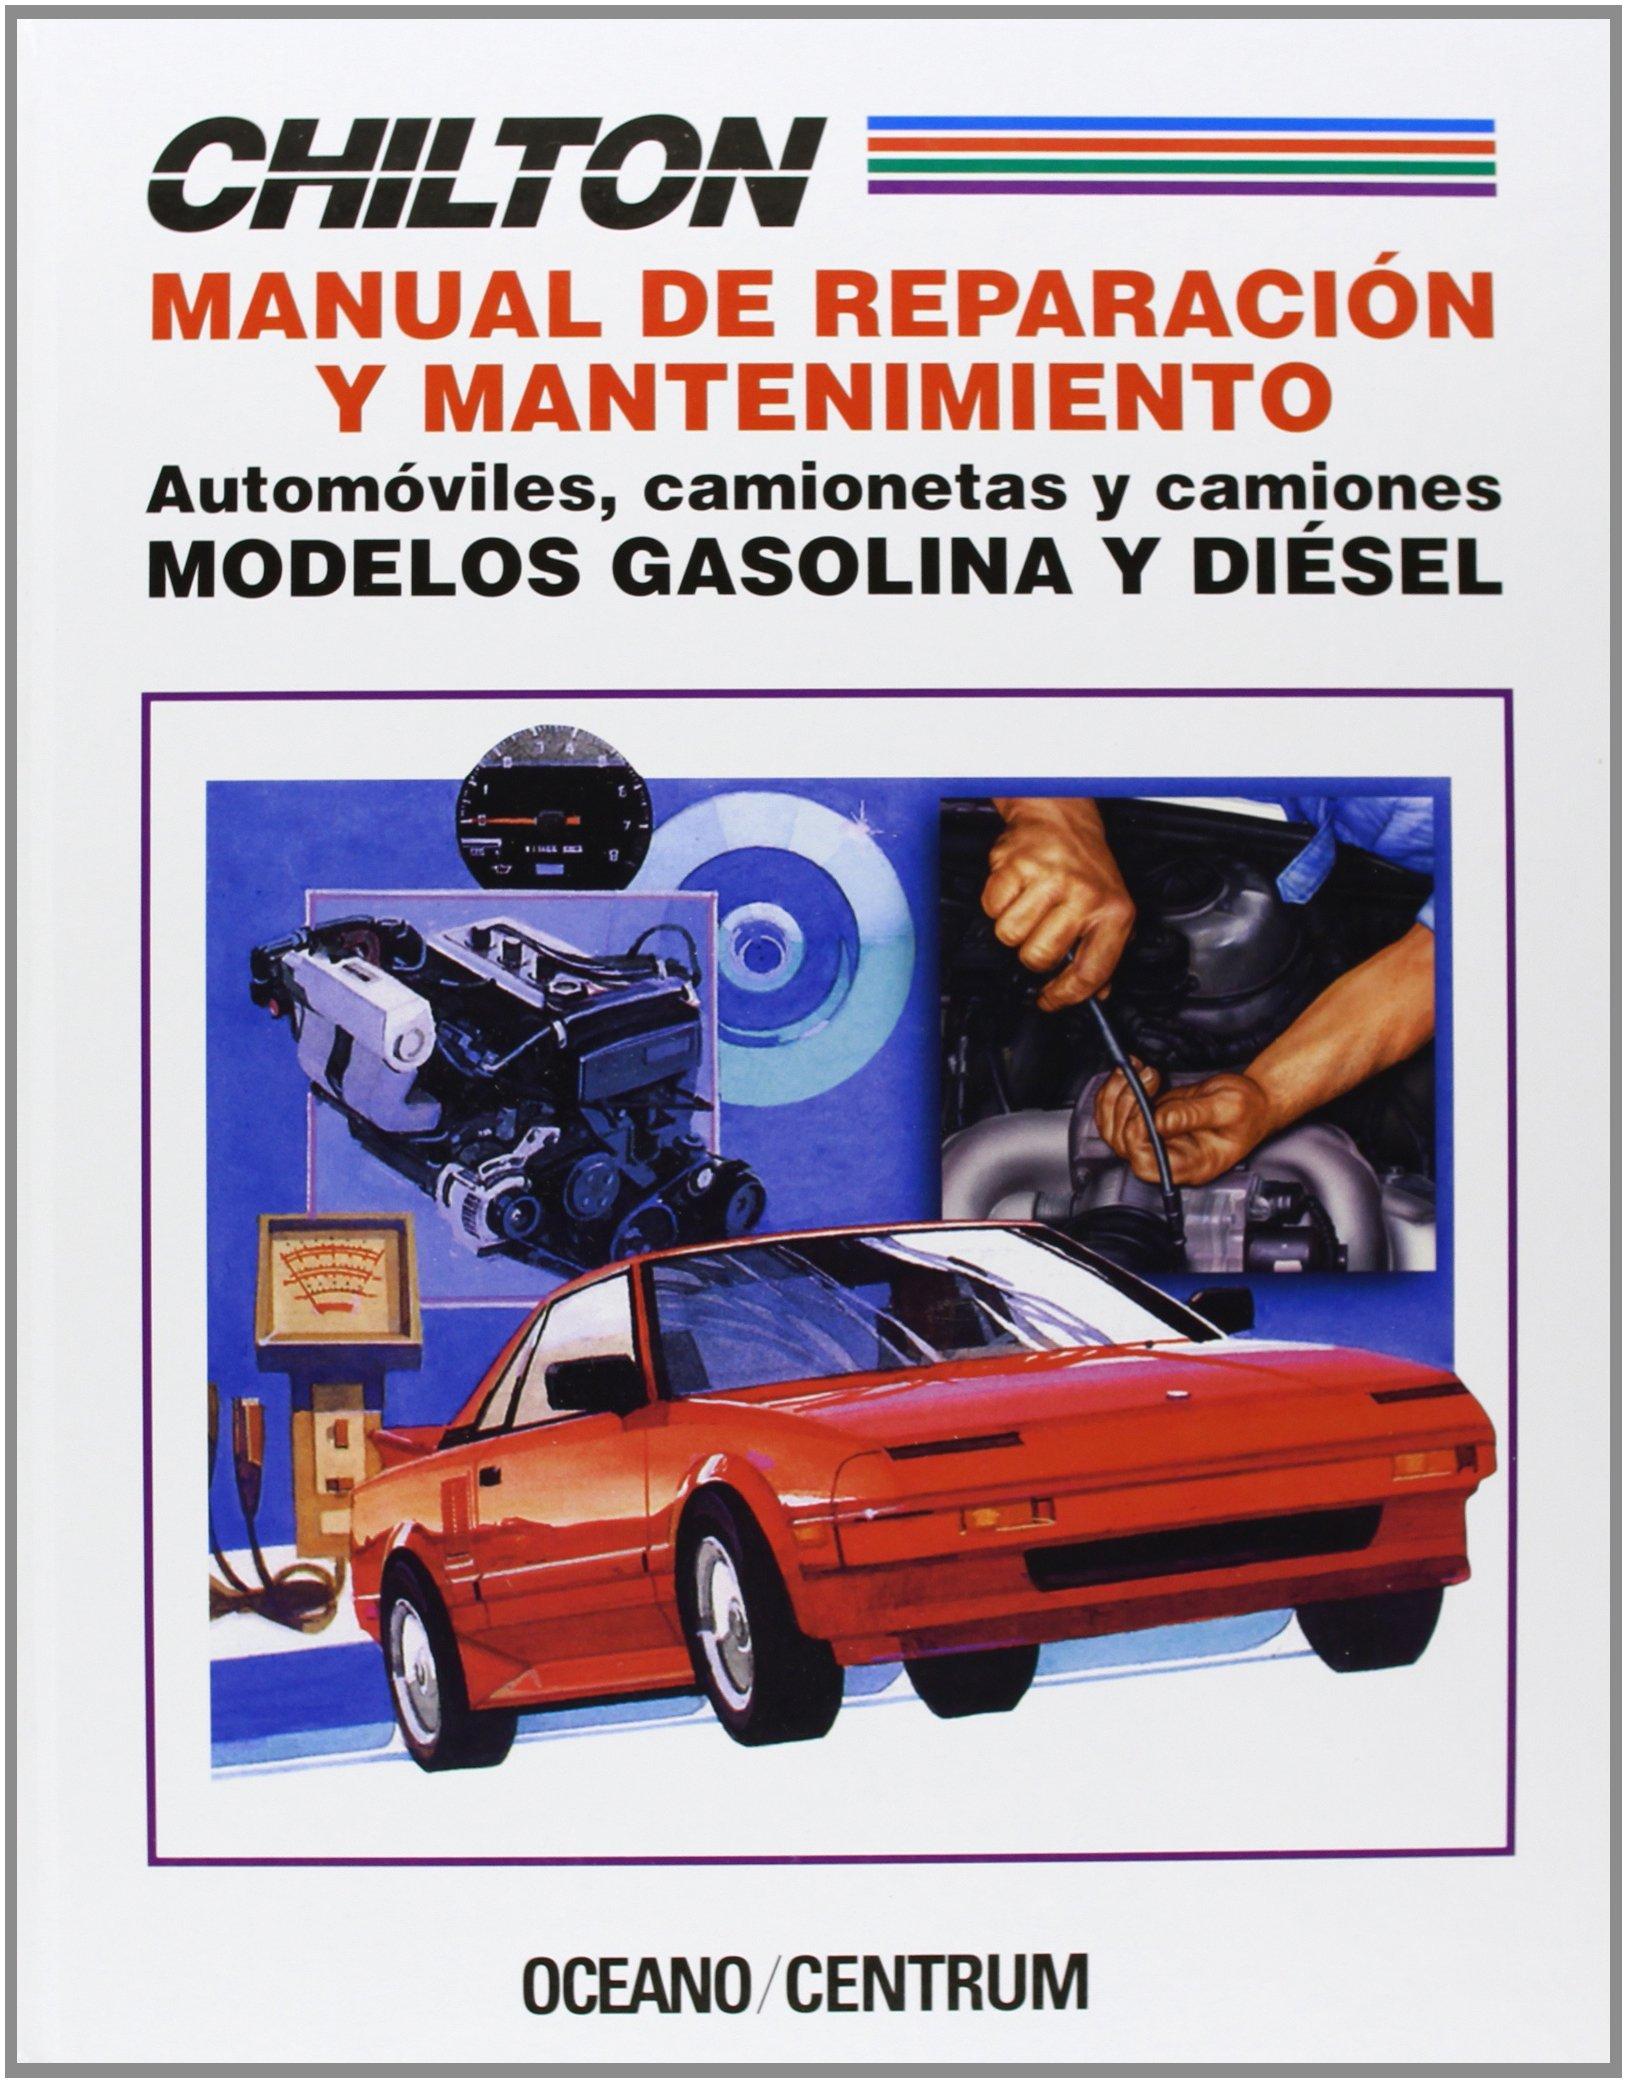 Chilton Manual De Reparacion Y Mantenimiento/chilton Manual of Restoration  And Maintenance (Spanish Edition): Carlos Jisterp: 9788449422171:  Amazon.com: ...